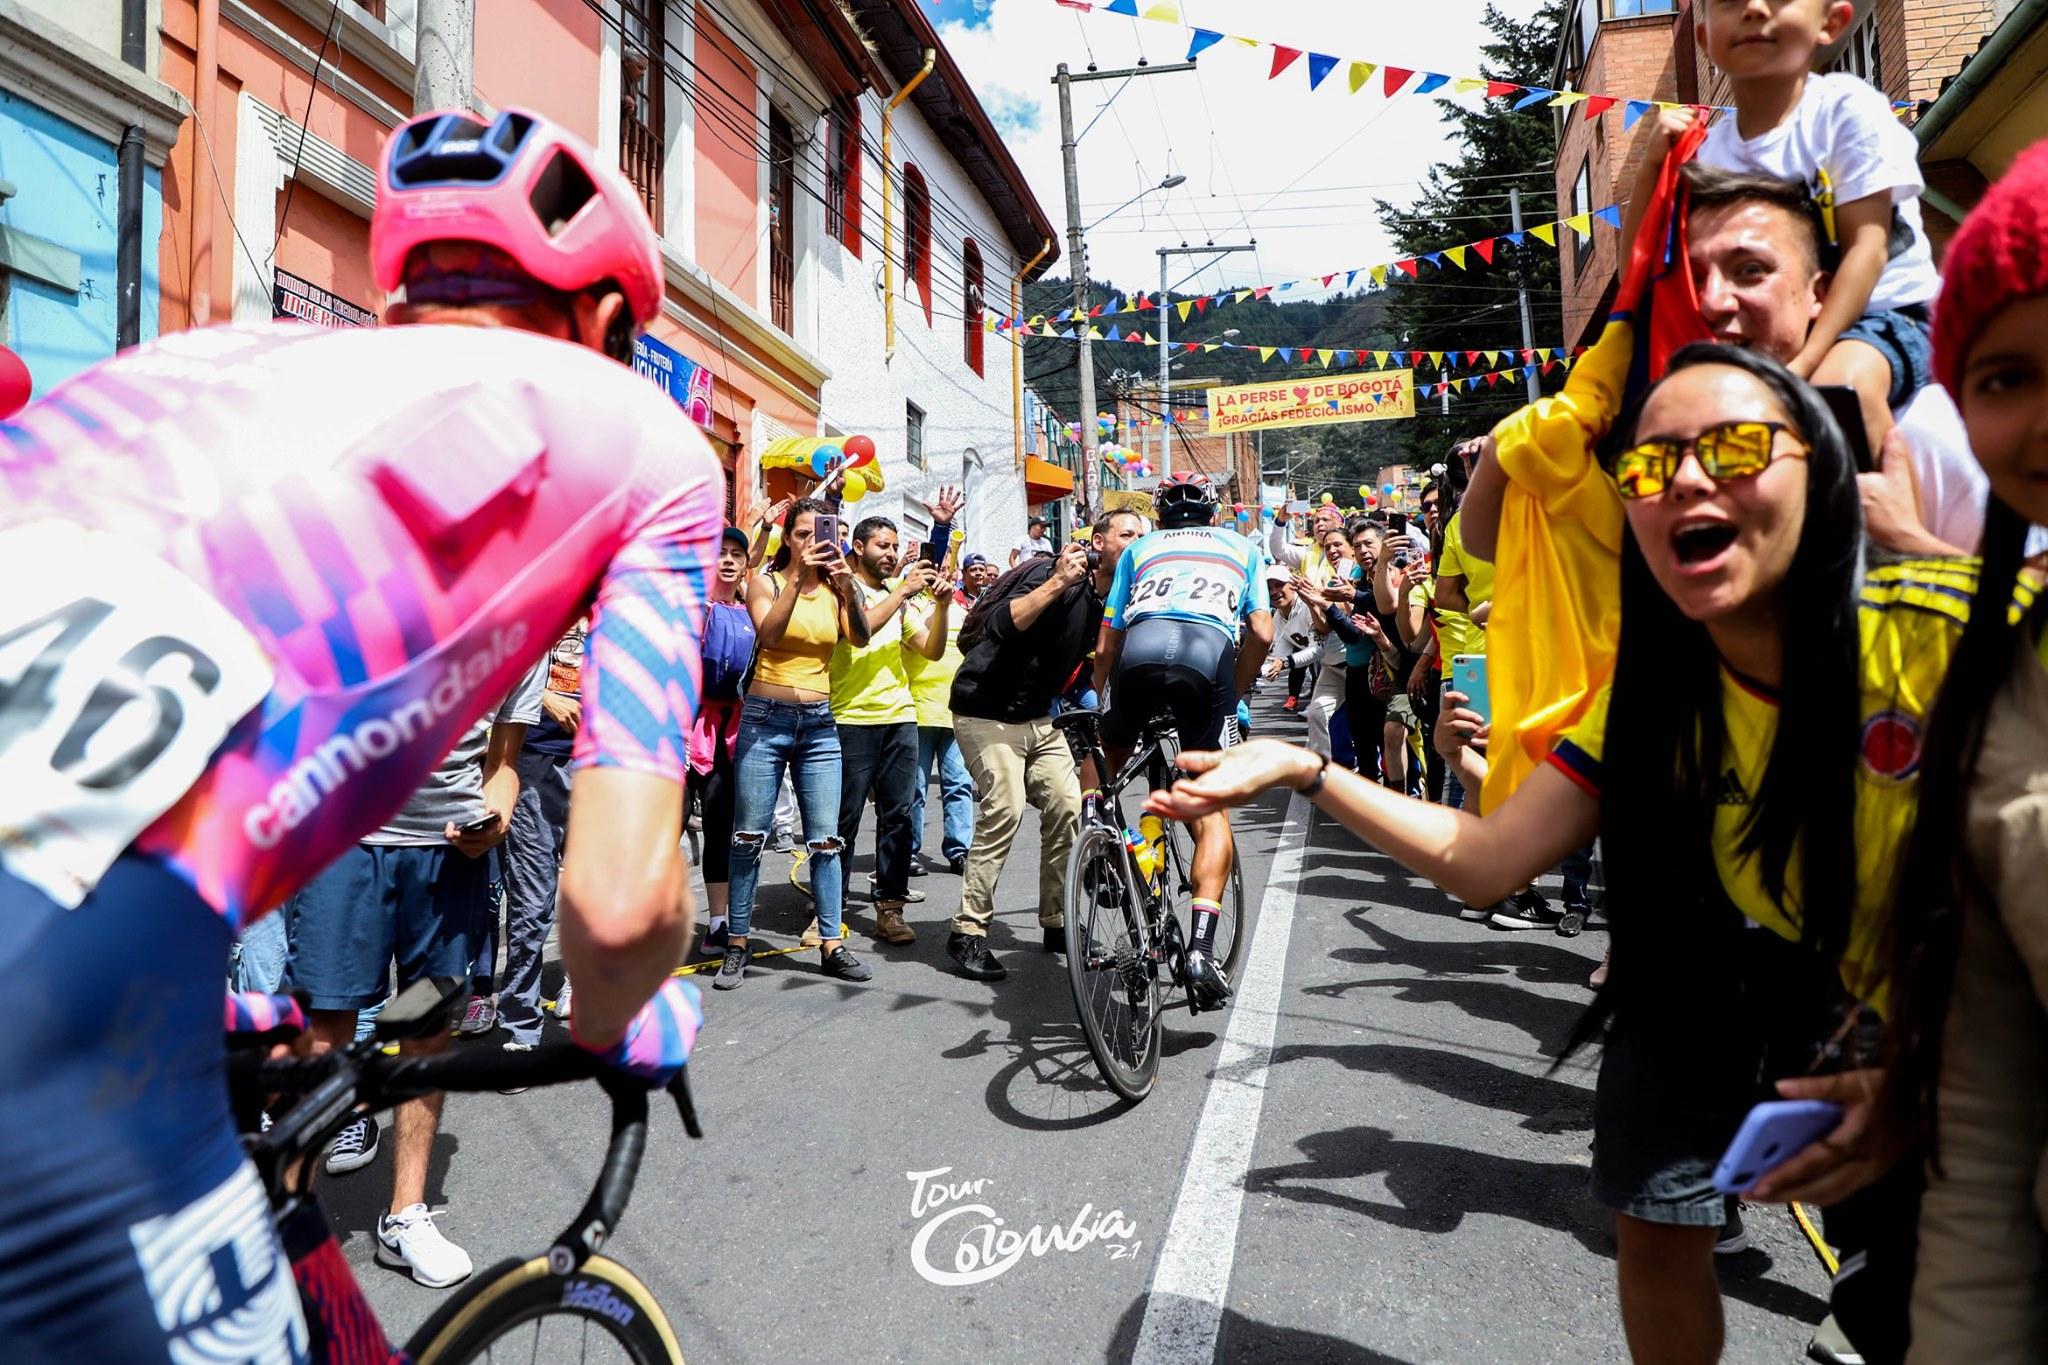 tour colombia cancelado